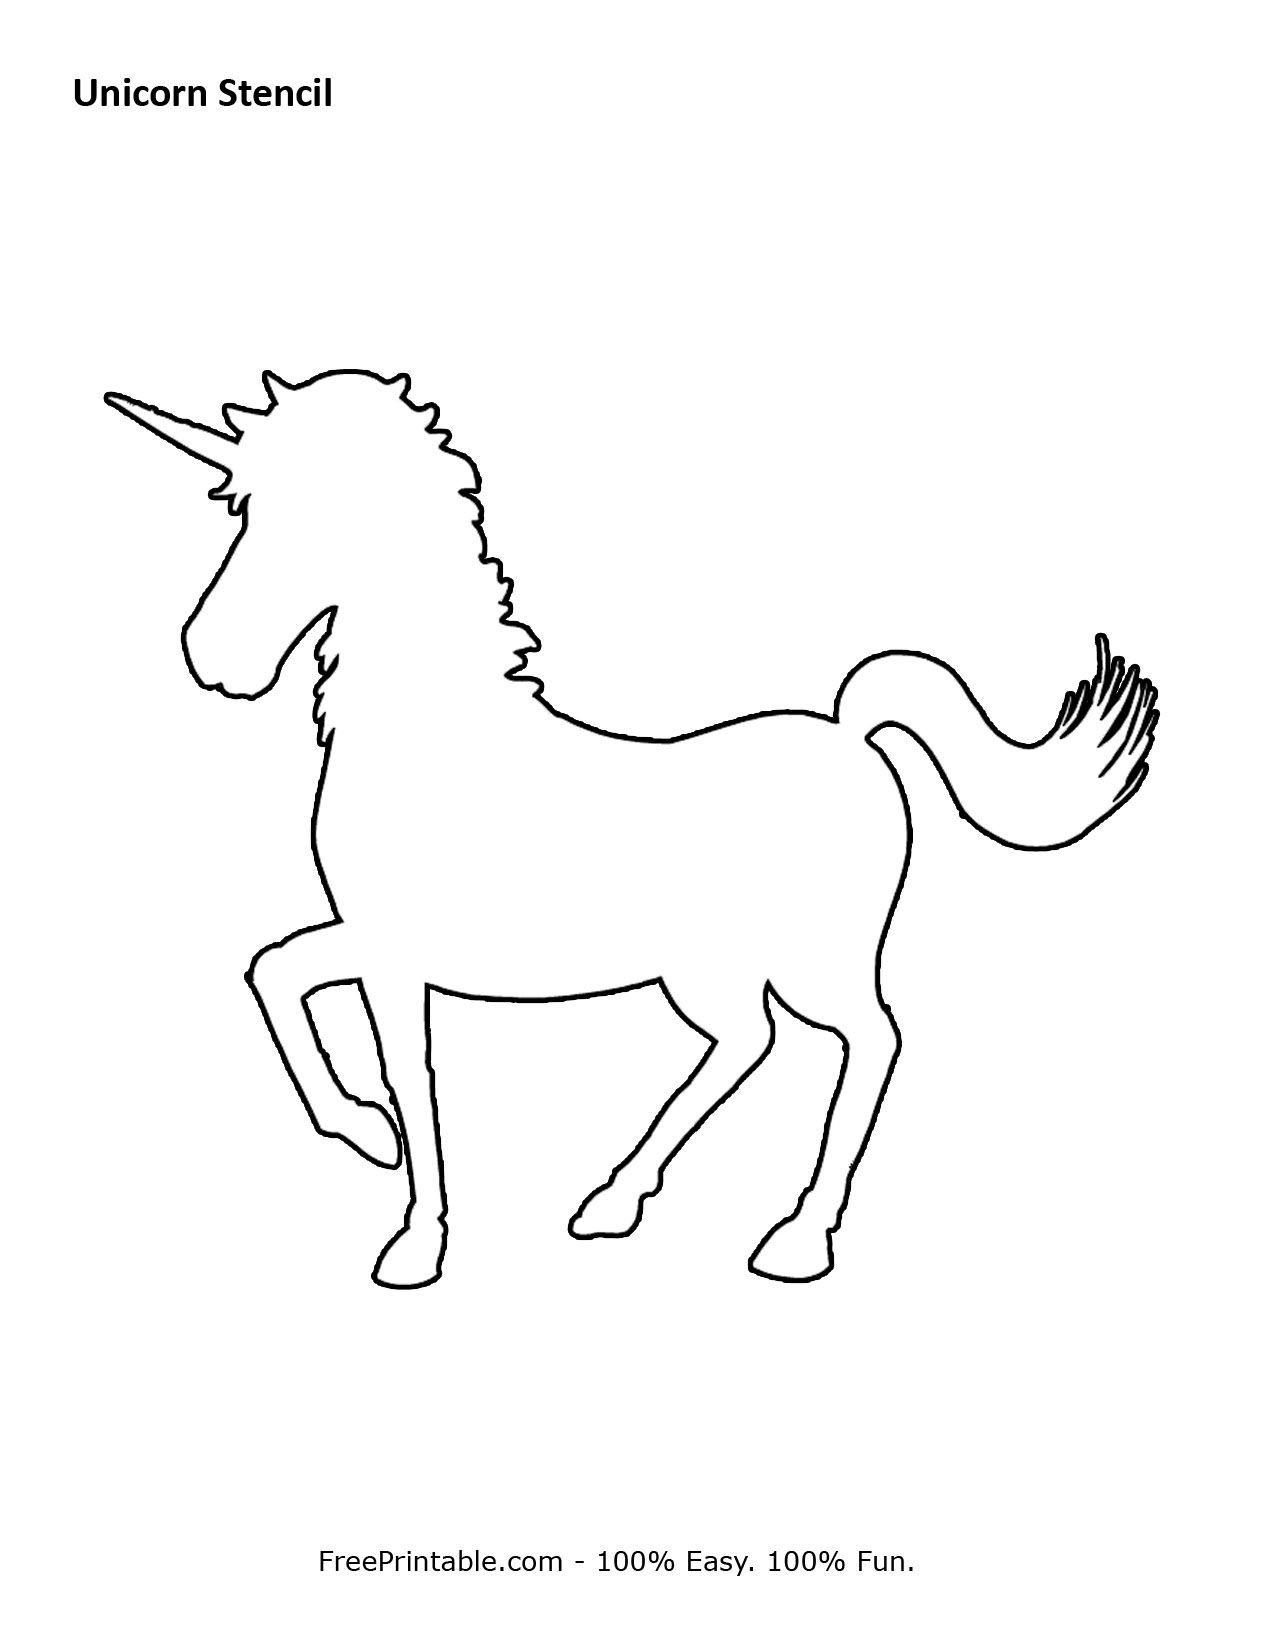 Free Printable Unicorn Stencils | Unicórnio | Pinterest | Unicorn ...